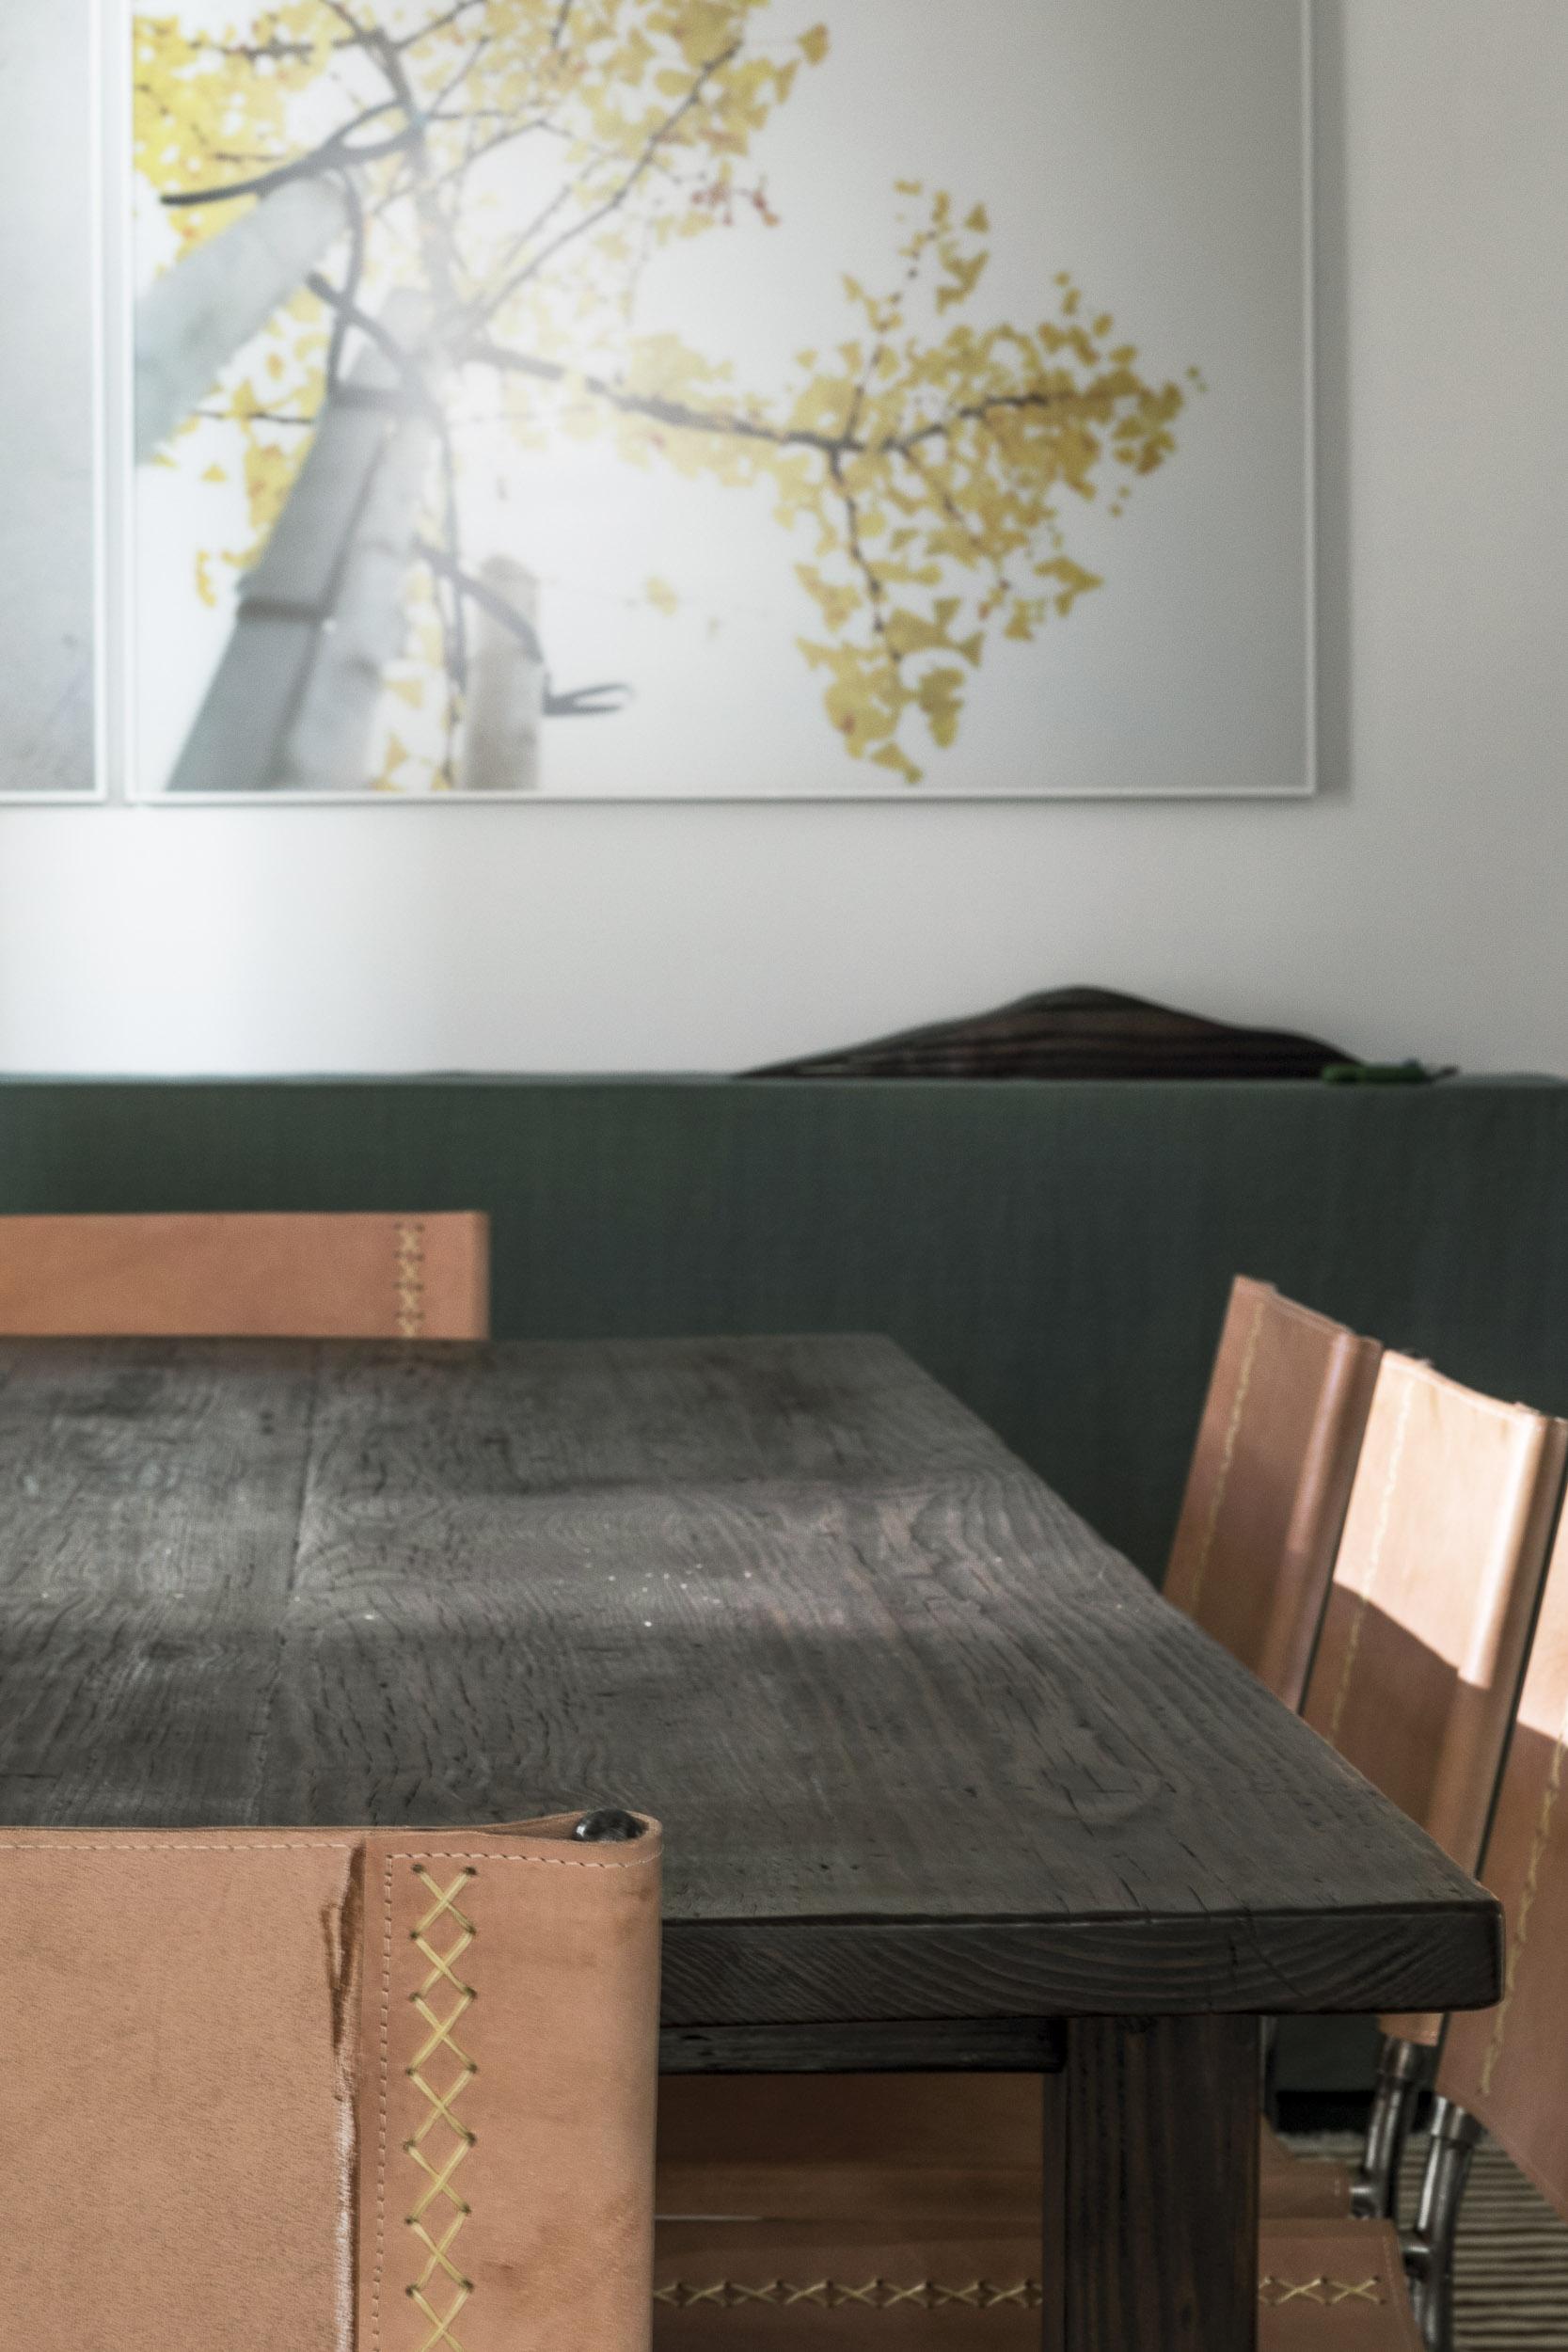 Dining JOLIET-Reath-DellOak_Final-1589V3_crop_WEBREADY.jpg